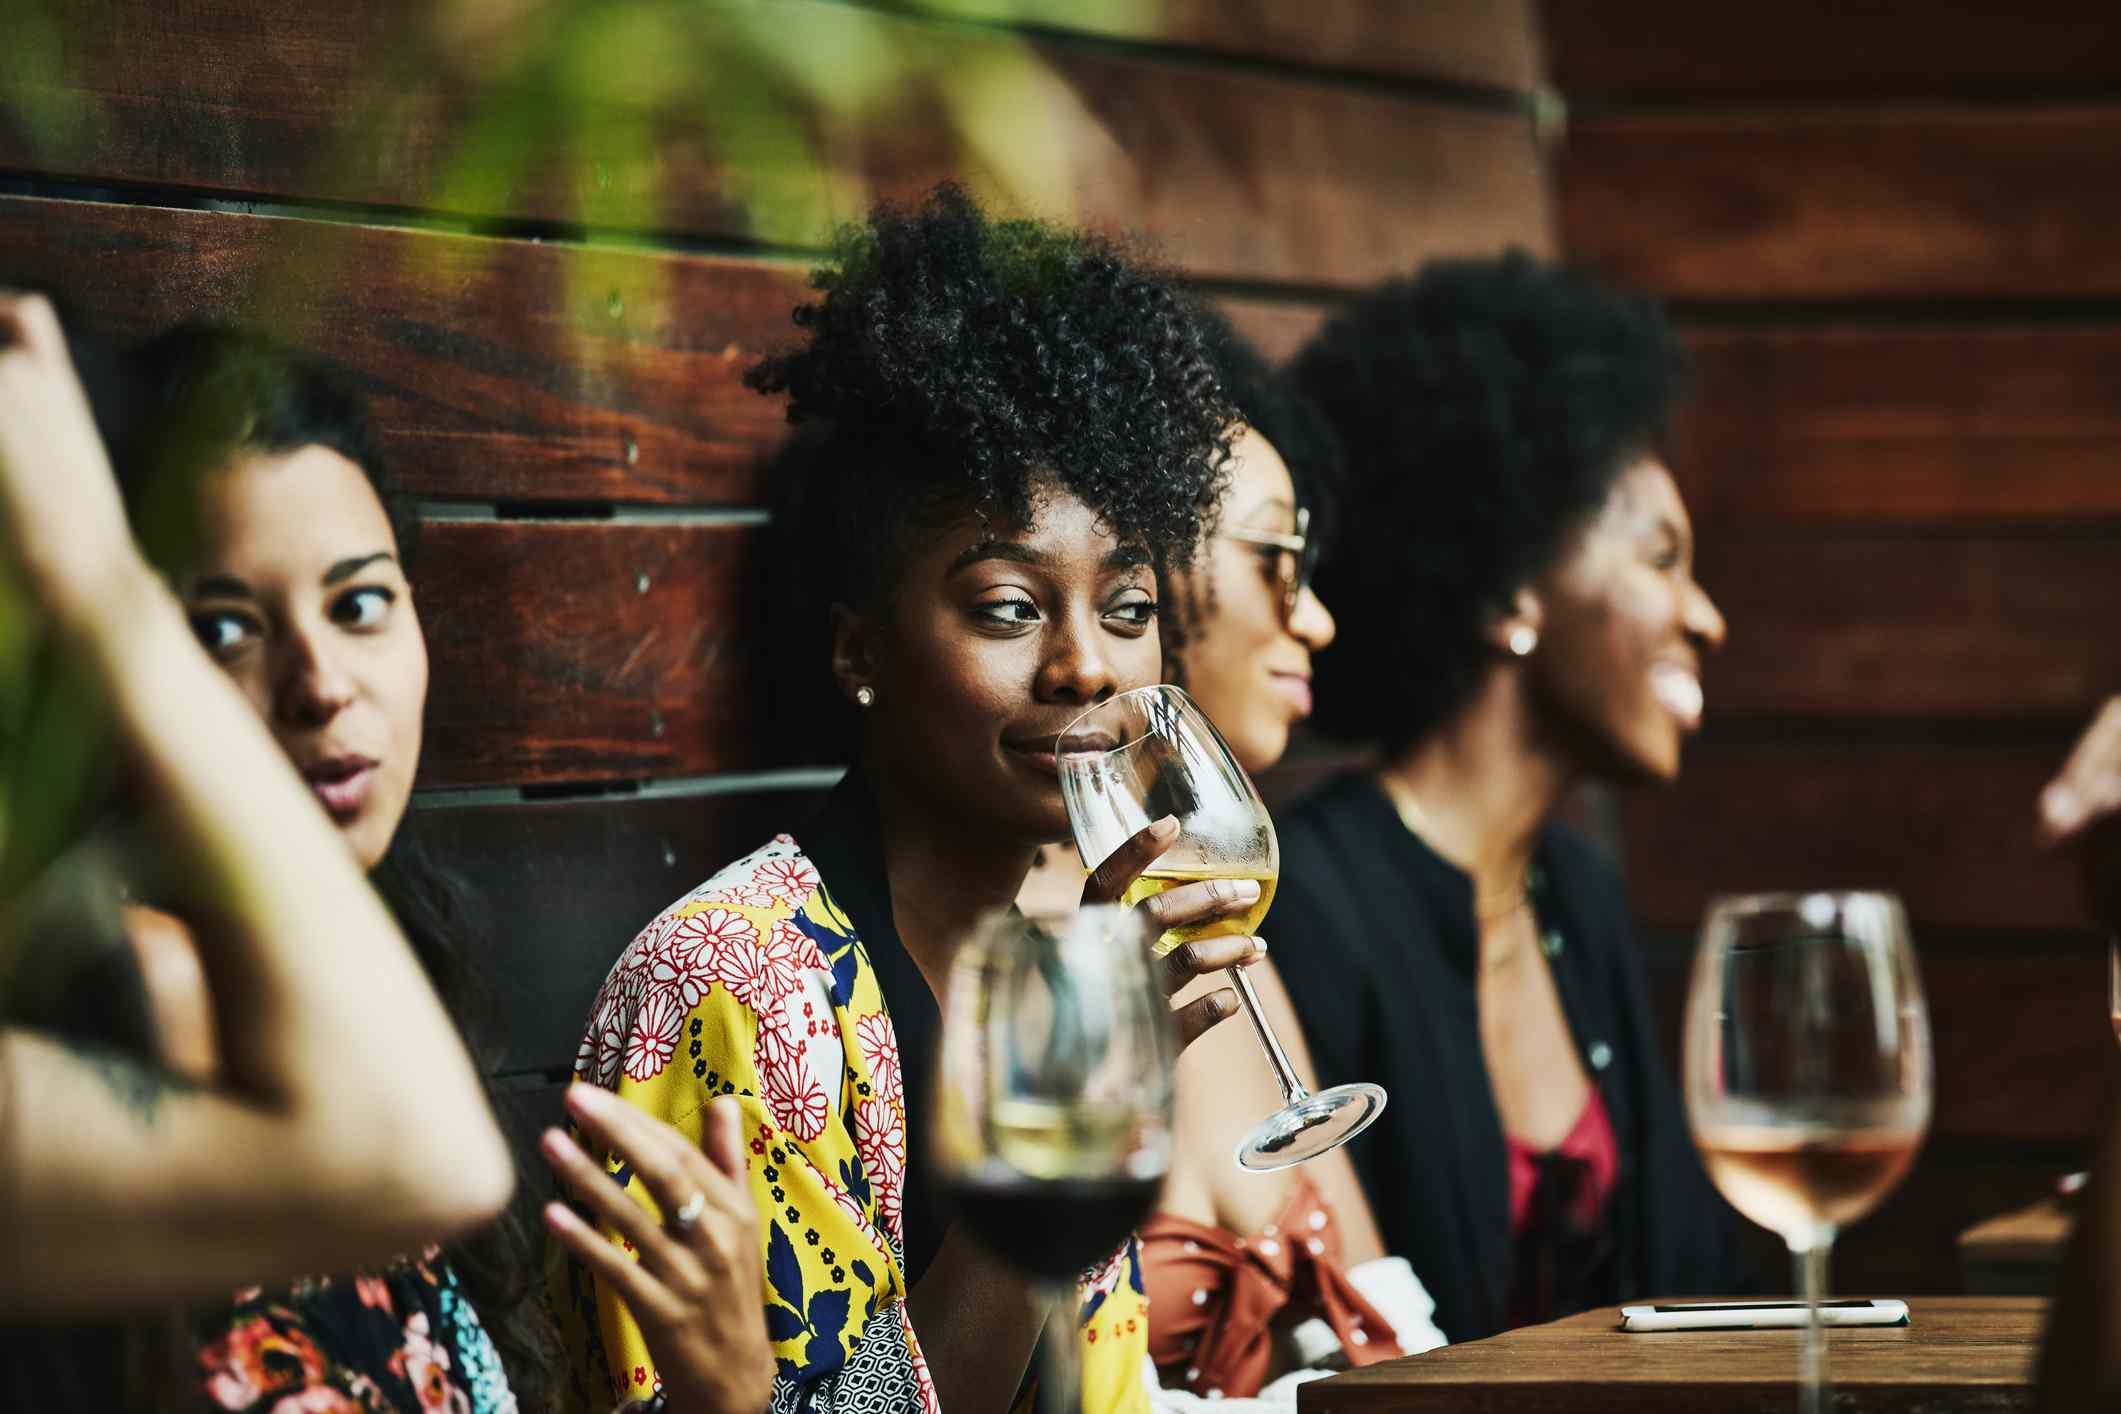 Friends enjoying wine together